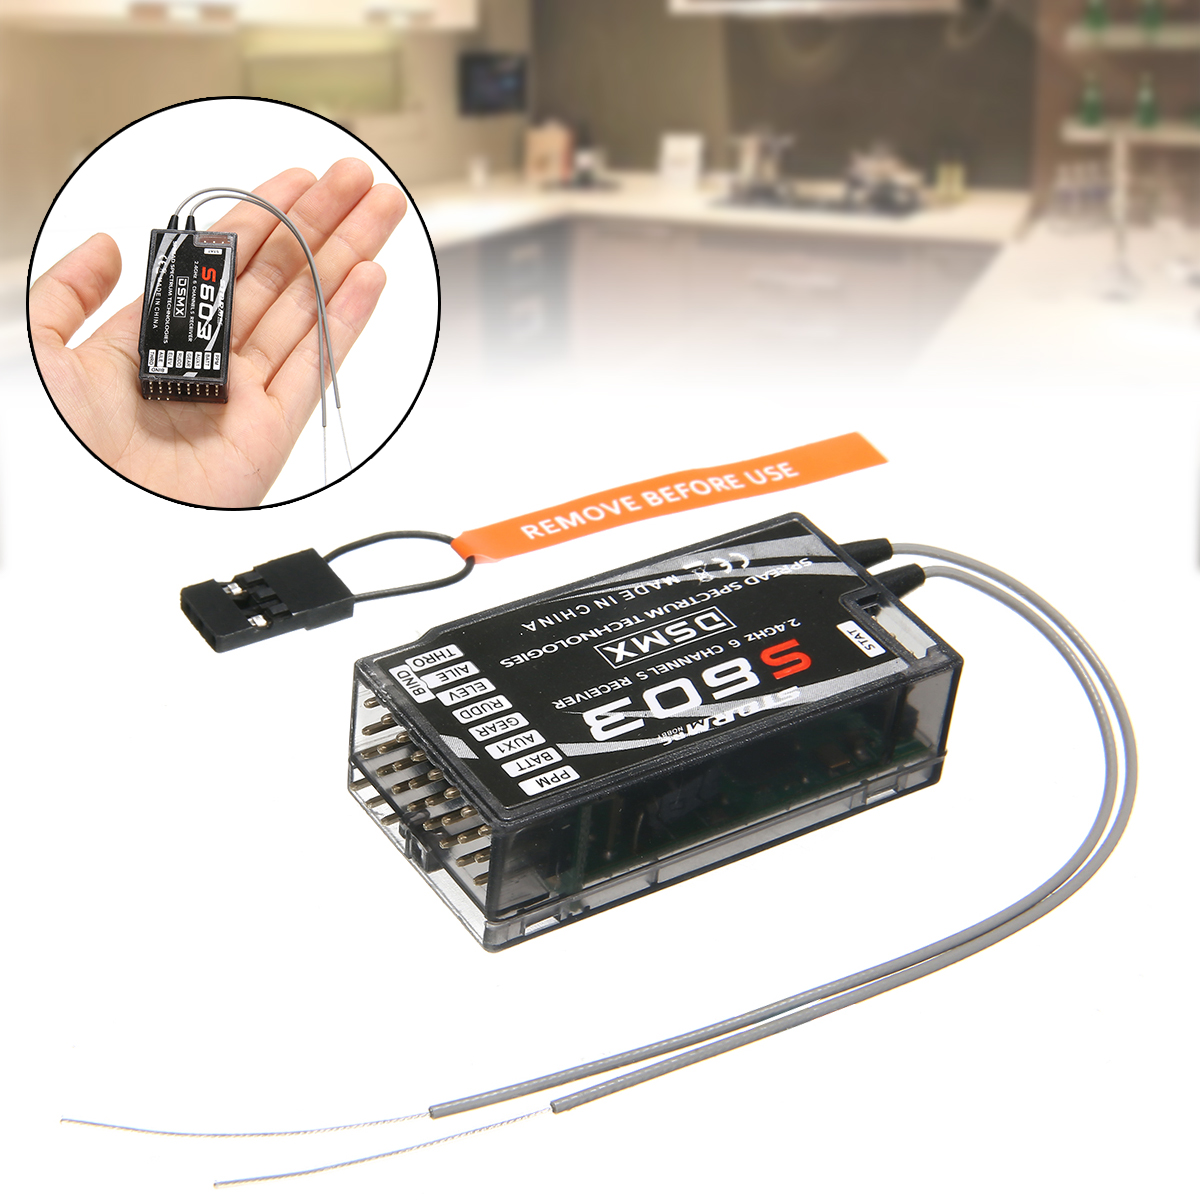 AR6210 DSMX 6-Channel Receiver RX Support DSM2 for Spektrum Transmitter RC New